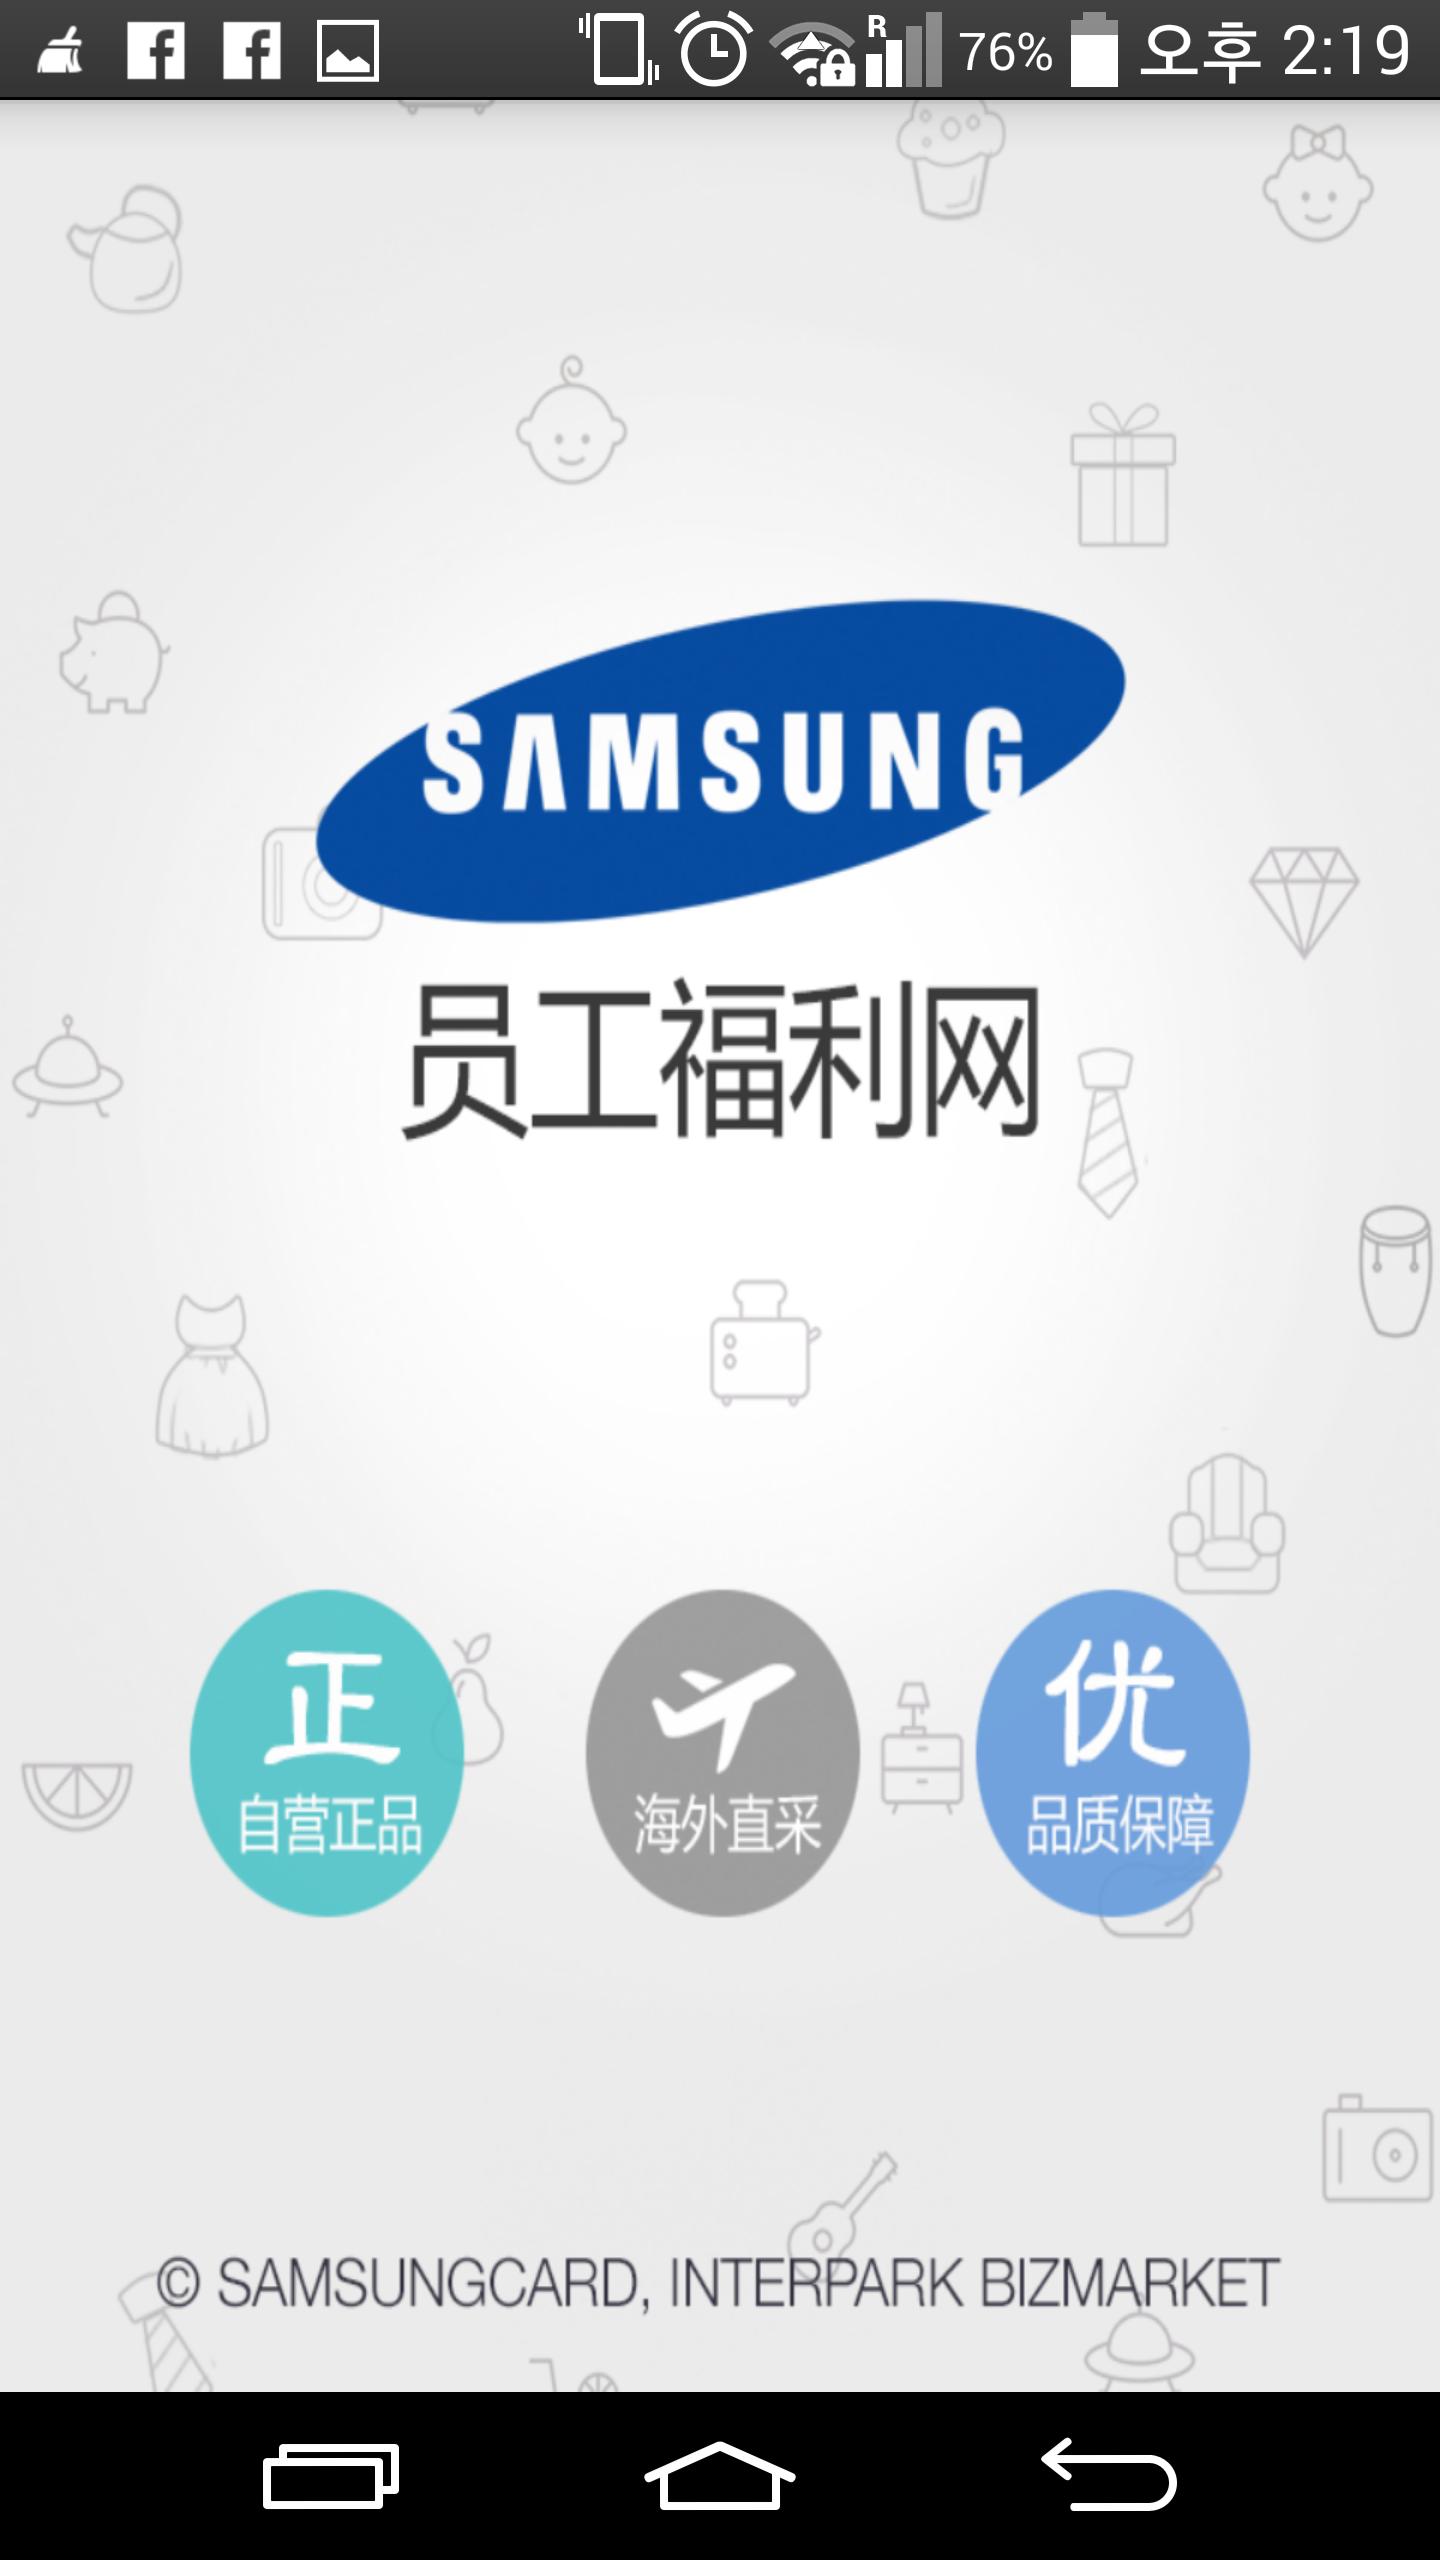 Samsung 员工福利网